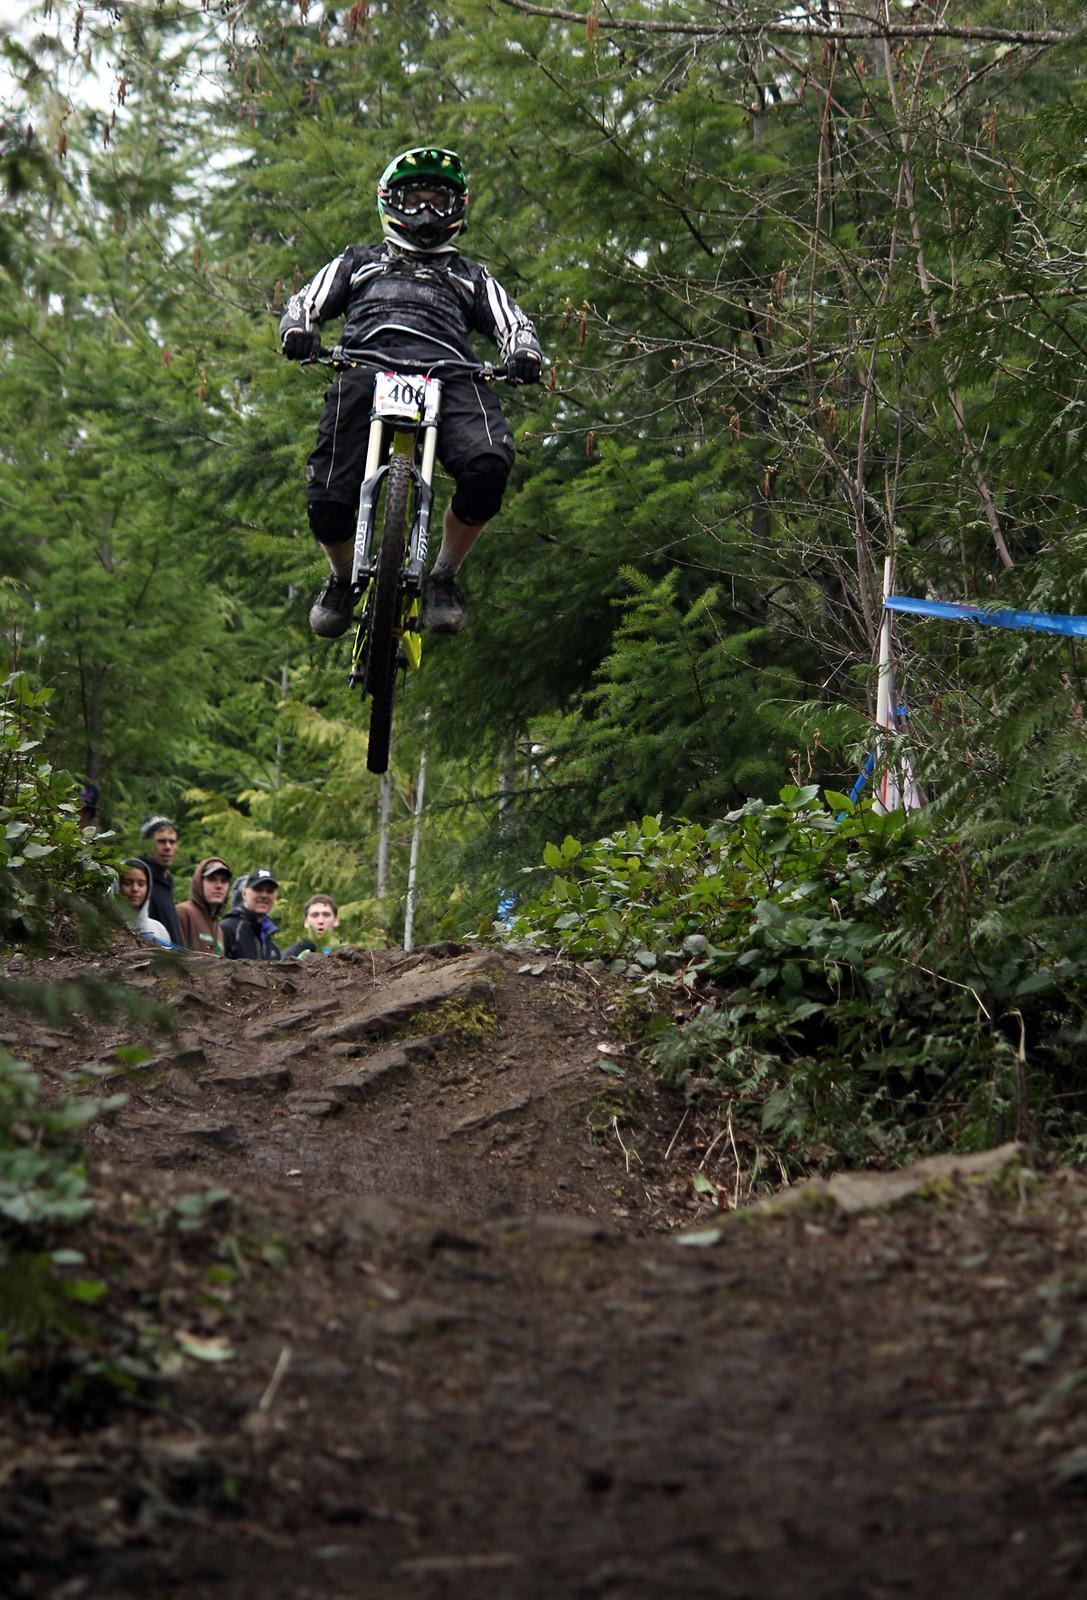 Adam Ransavage's Bar Hump - bturman - Mountain Biking Pictures - Vital MTB